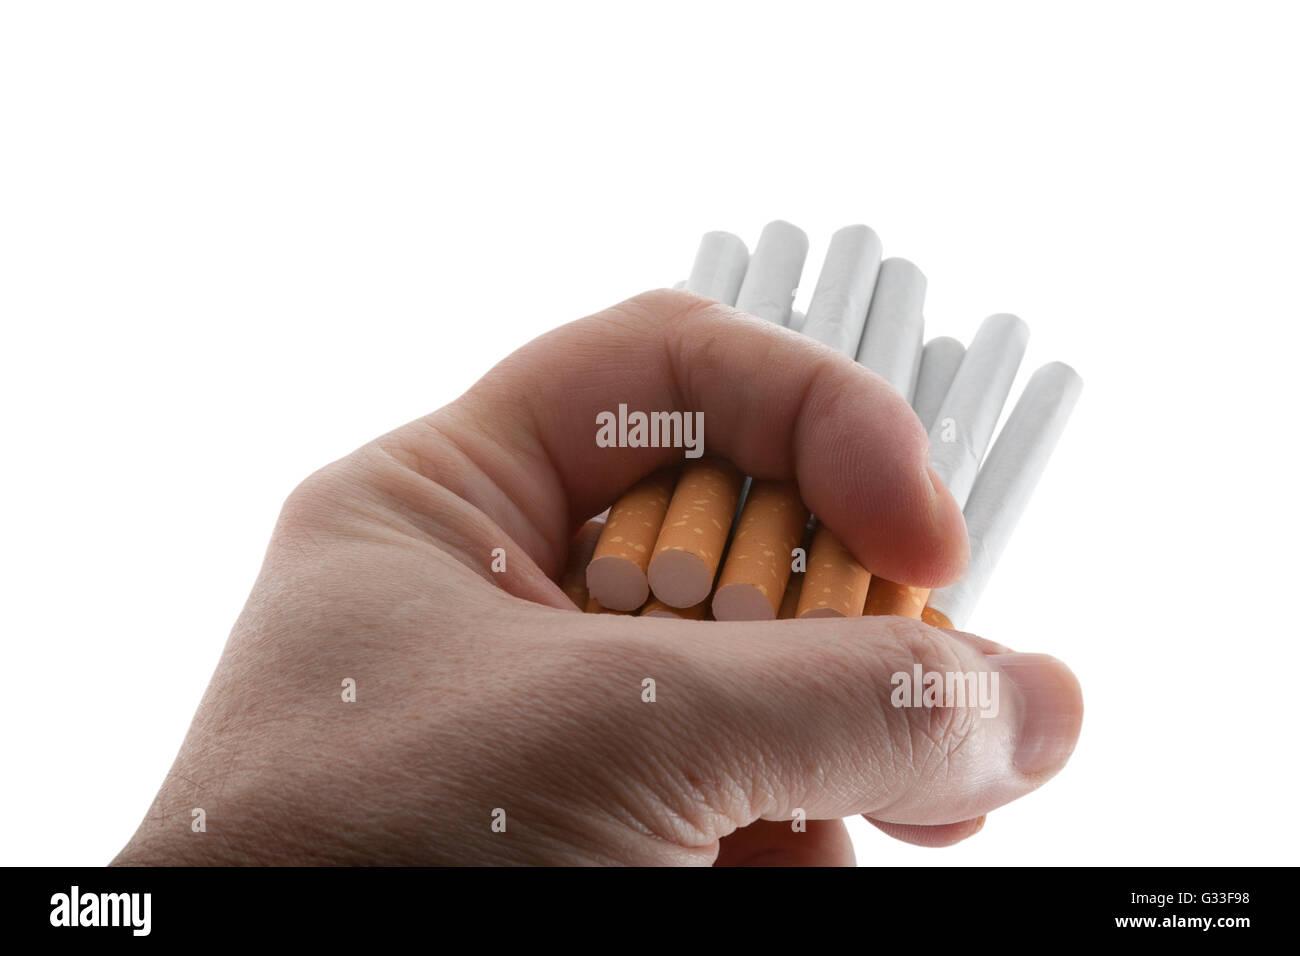 lethal dose of nicotine - Stock Image